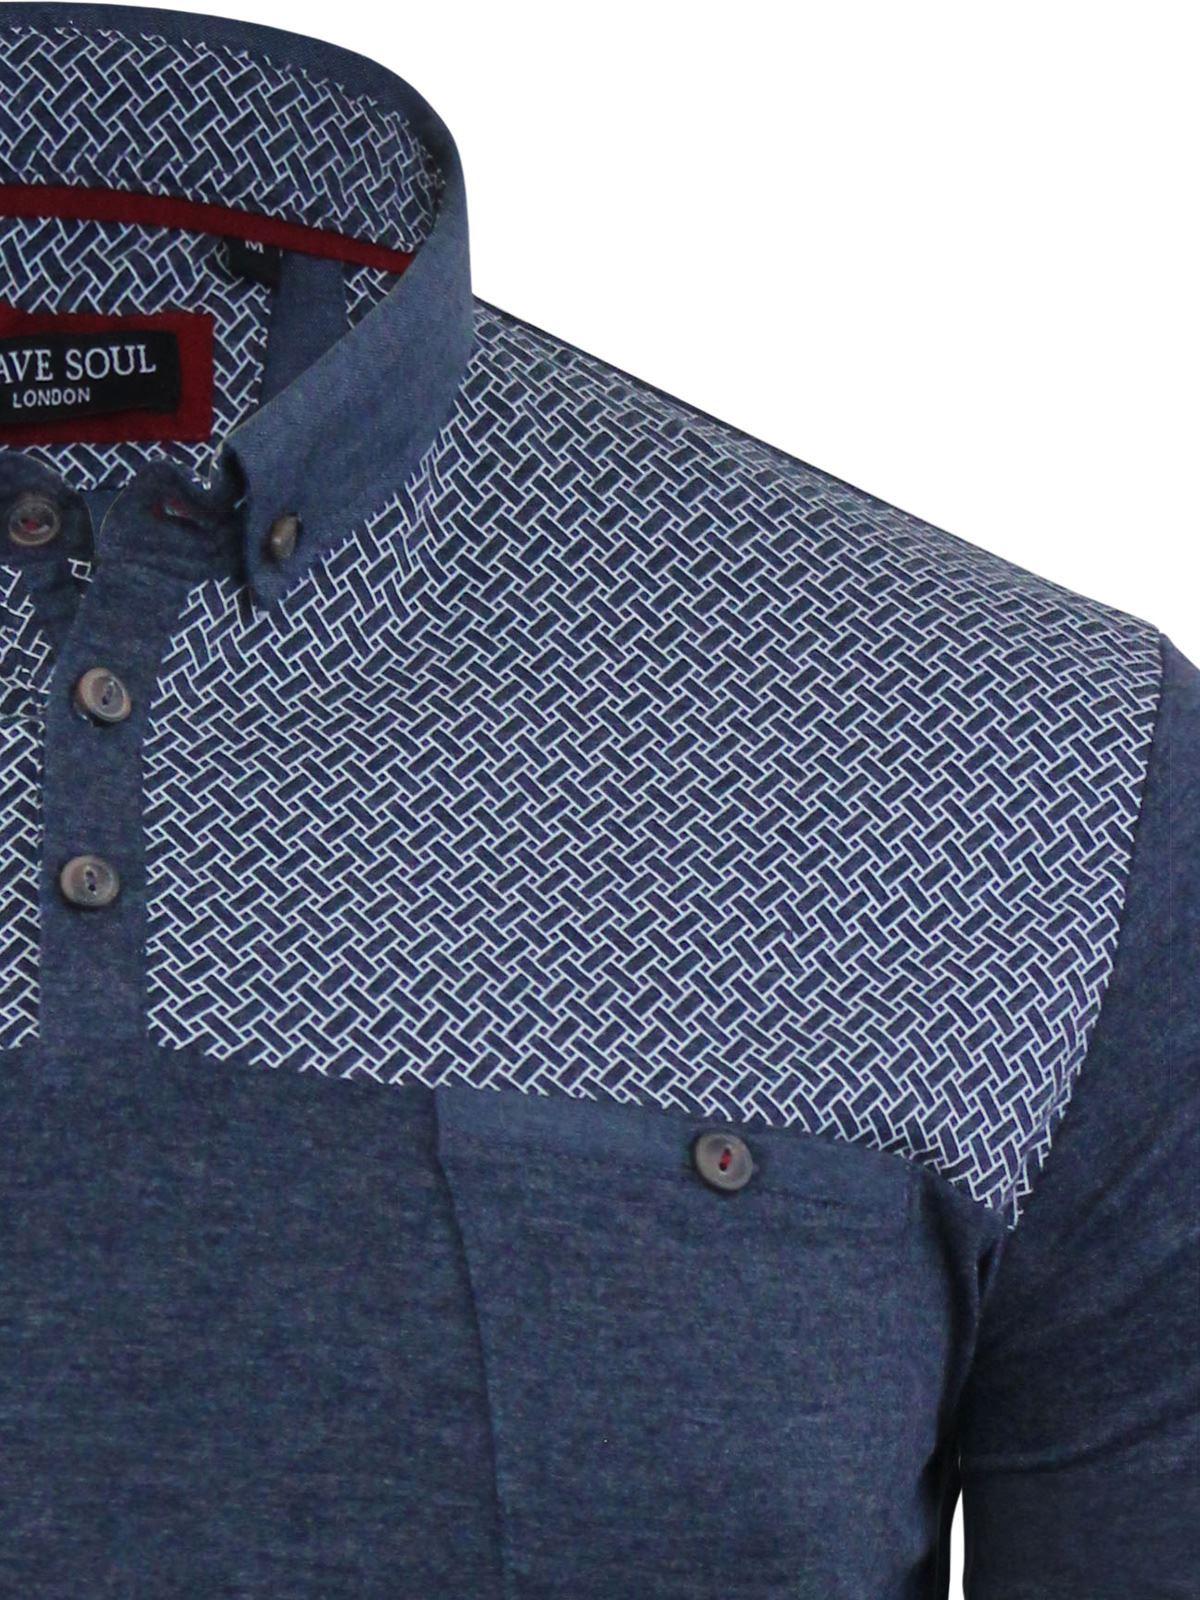 Mens-Polo-T-Shirt-Brave-Soul-Aqua-Printed-Short-Sleeve-Chambray-Collar-Top thumbnail 4